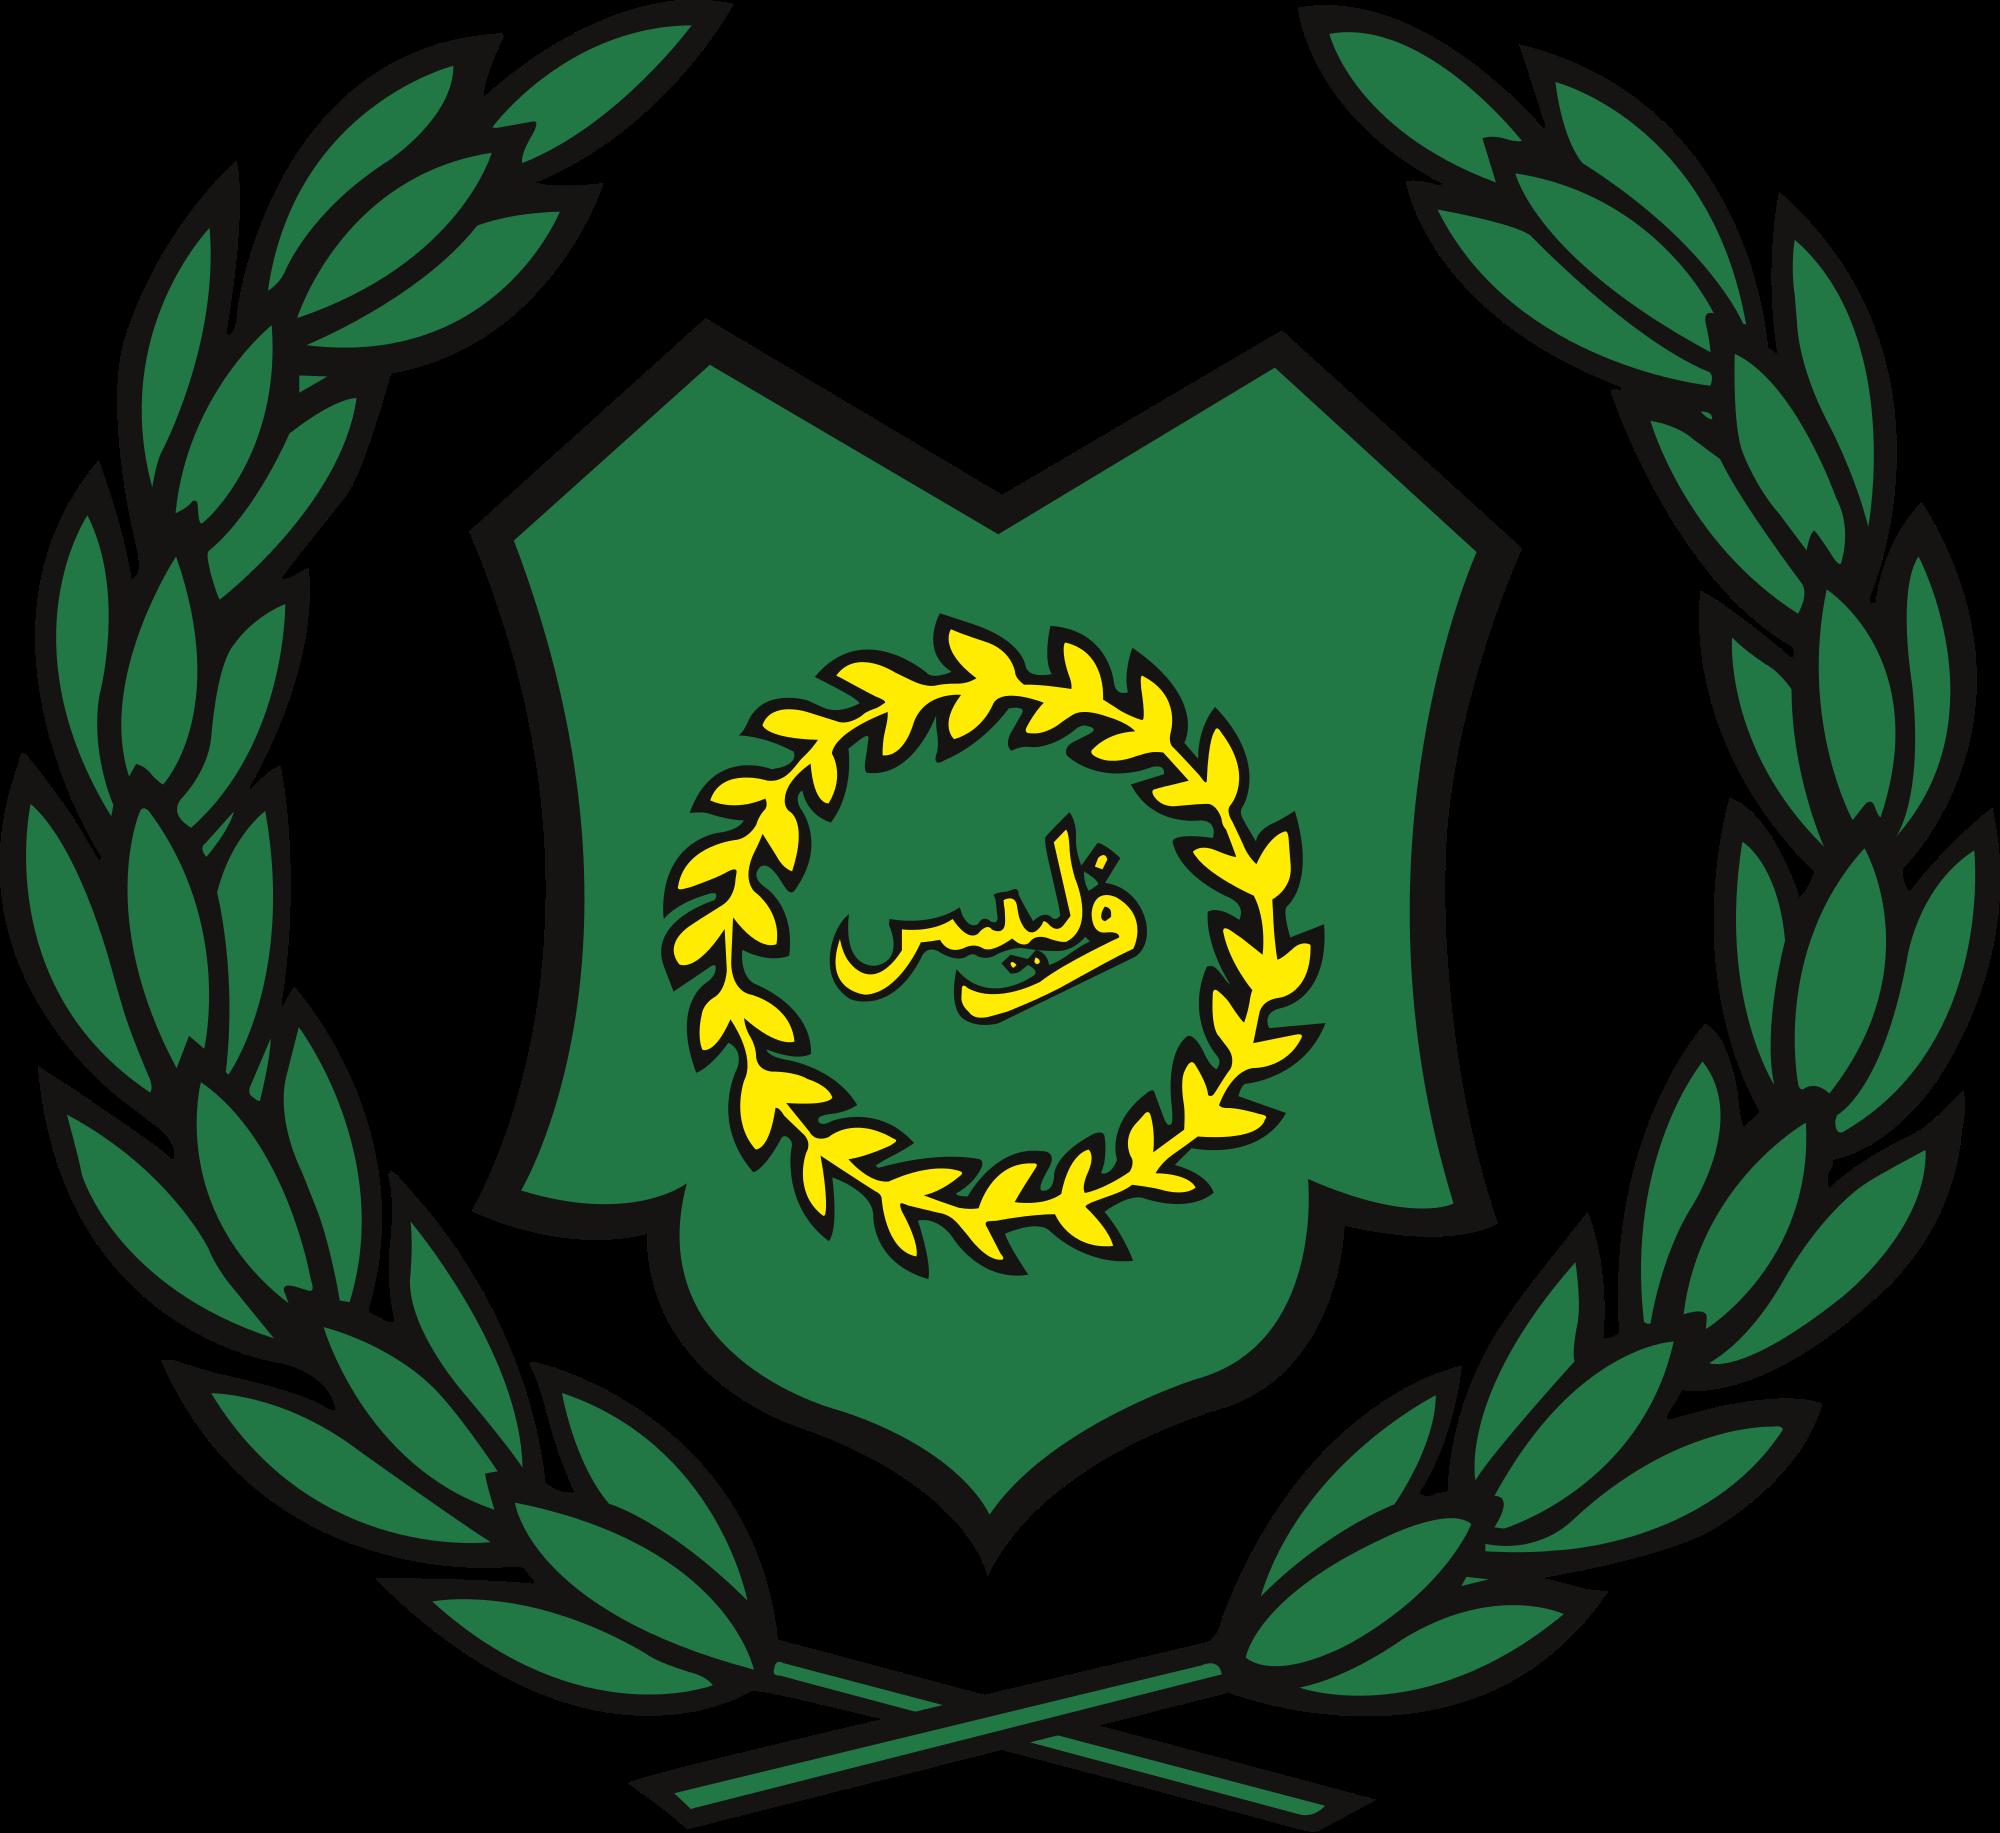 Gambar Bendera Dan Lambang Negara Myanmar